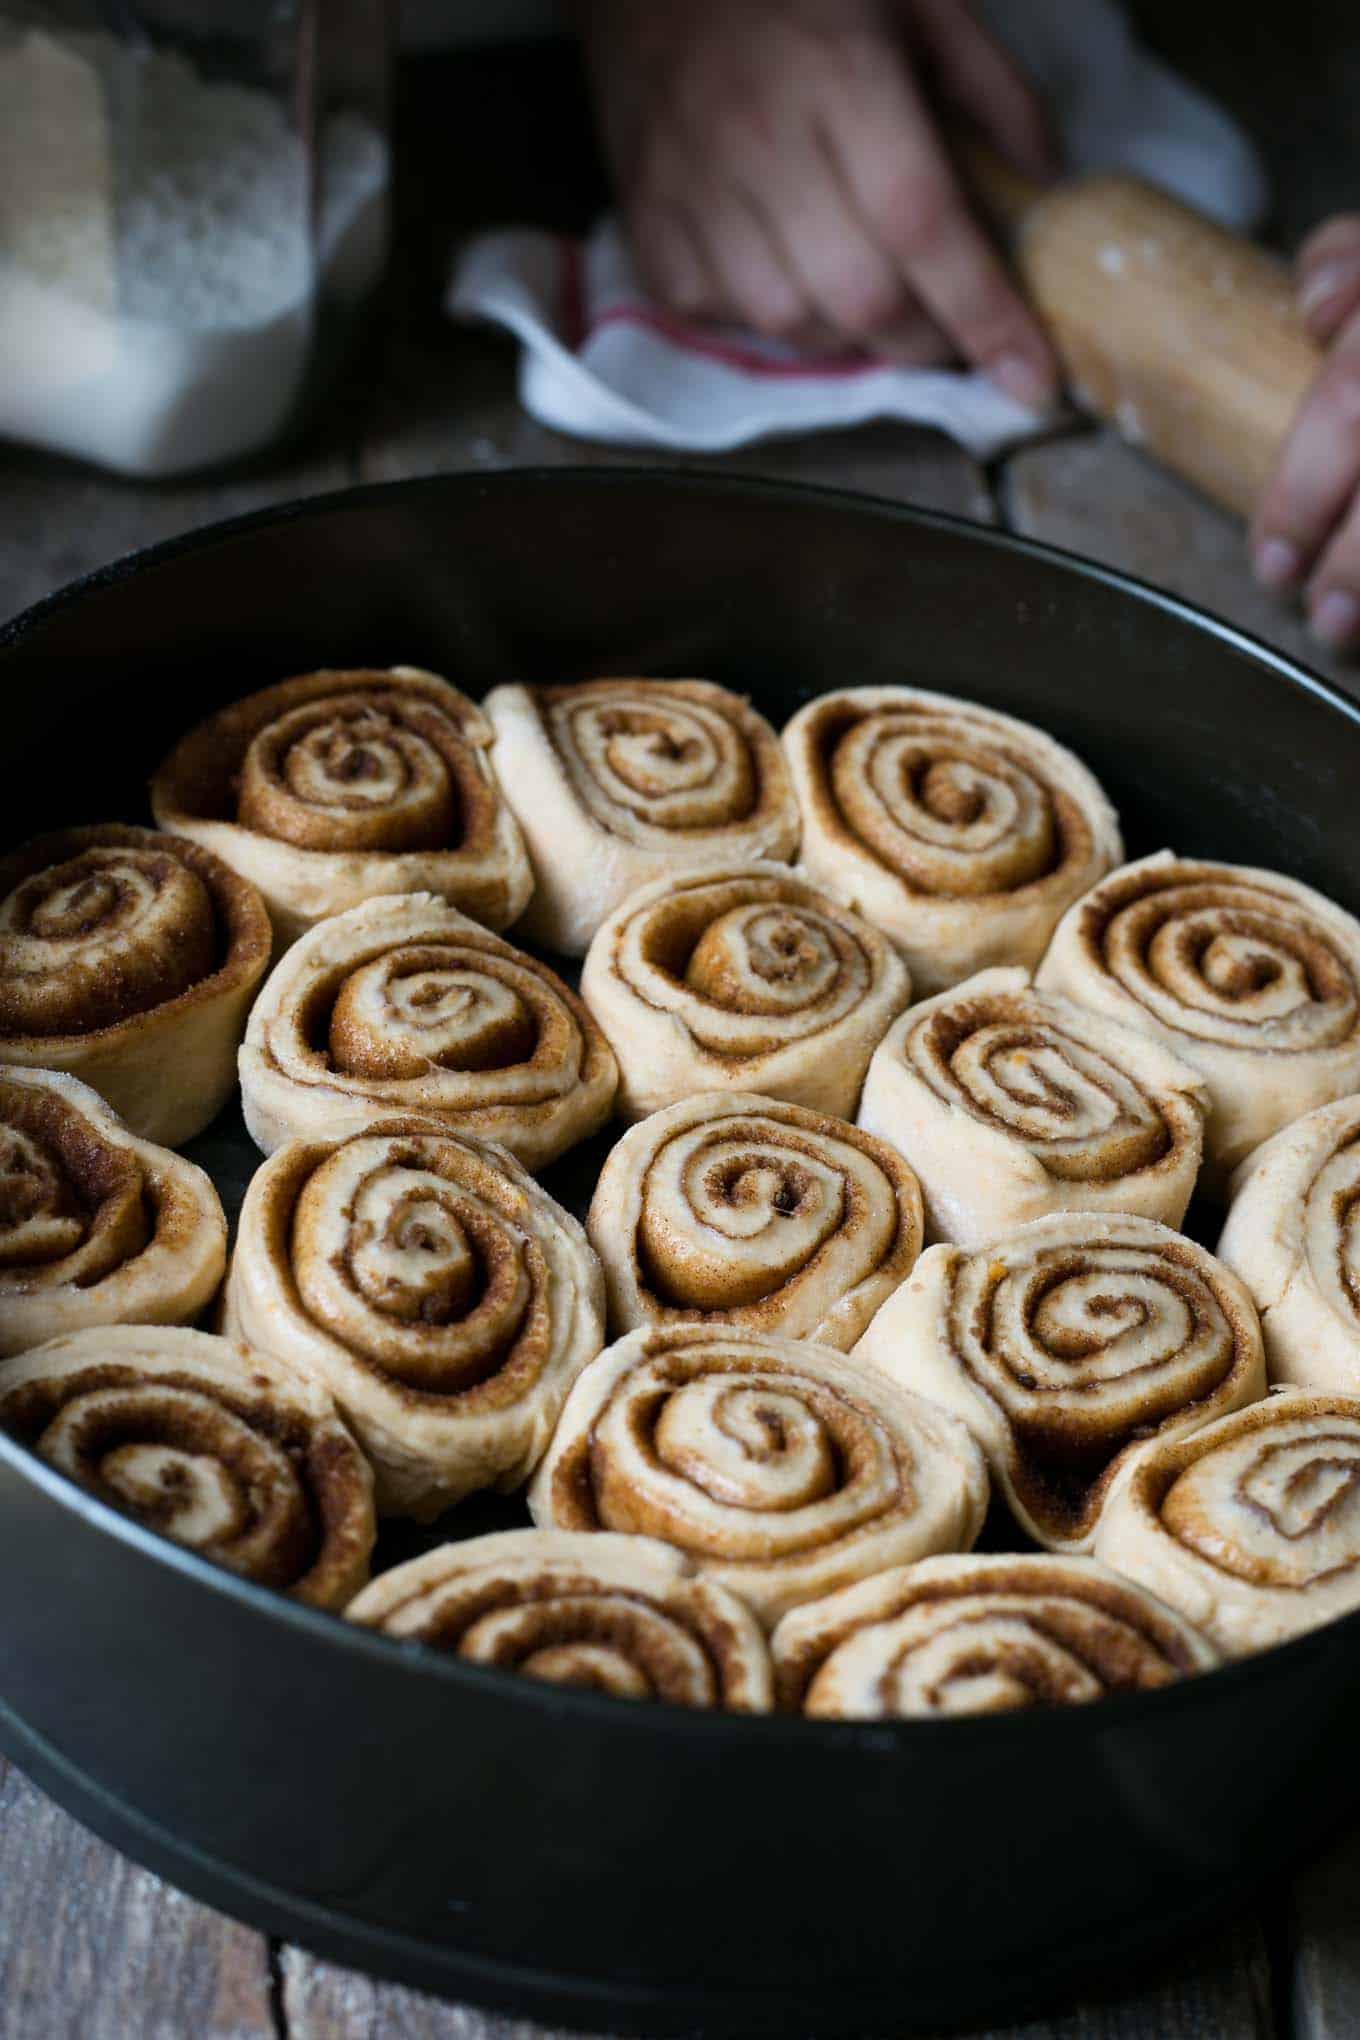 Utterly delicious and super fluffy sweet potato cinnamon rolls! #vegan #cinnamonrolls #dairyfree | via@annabanana.co